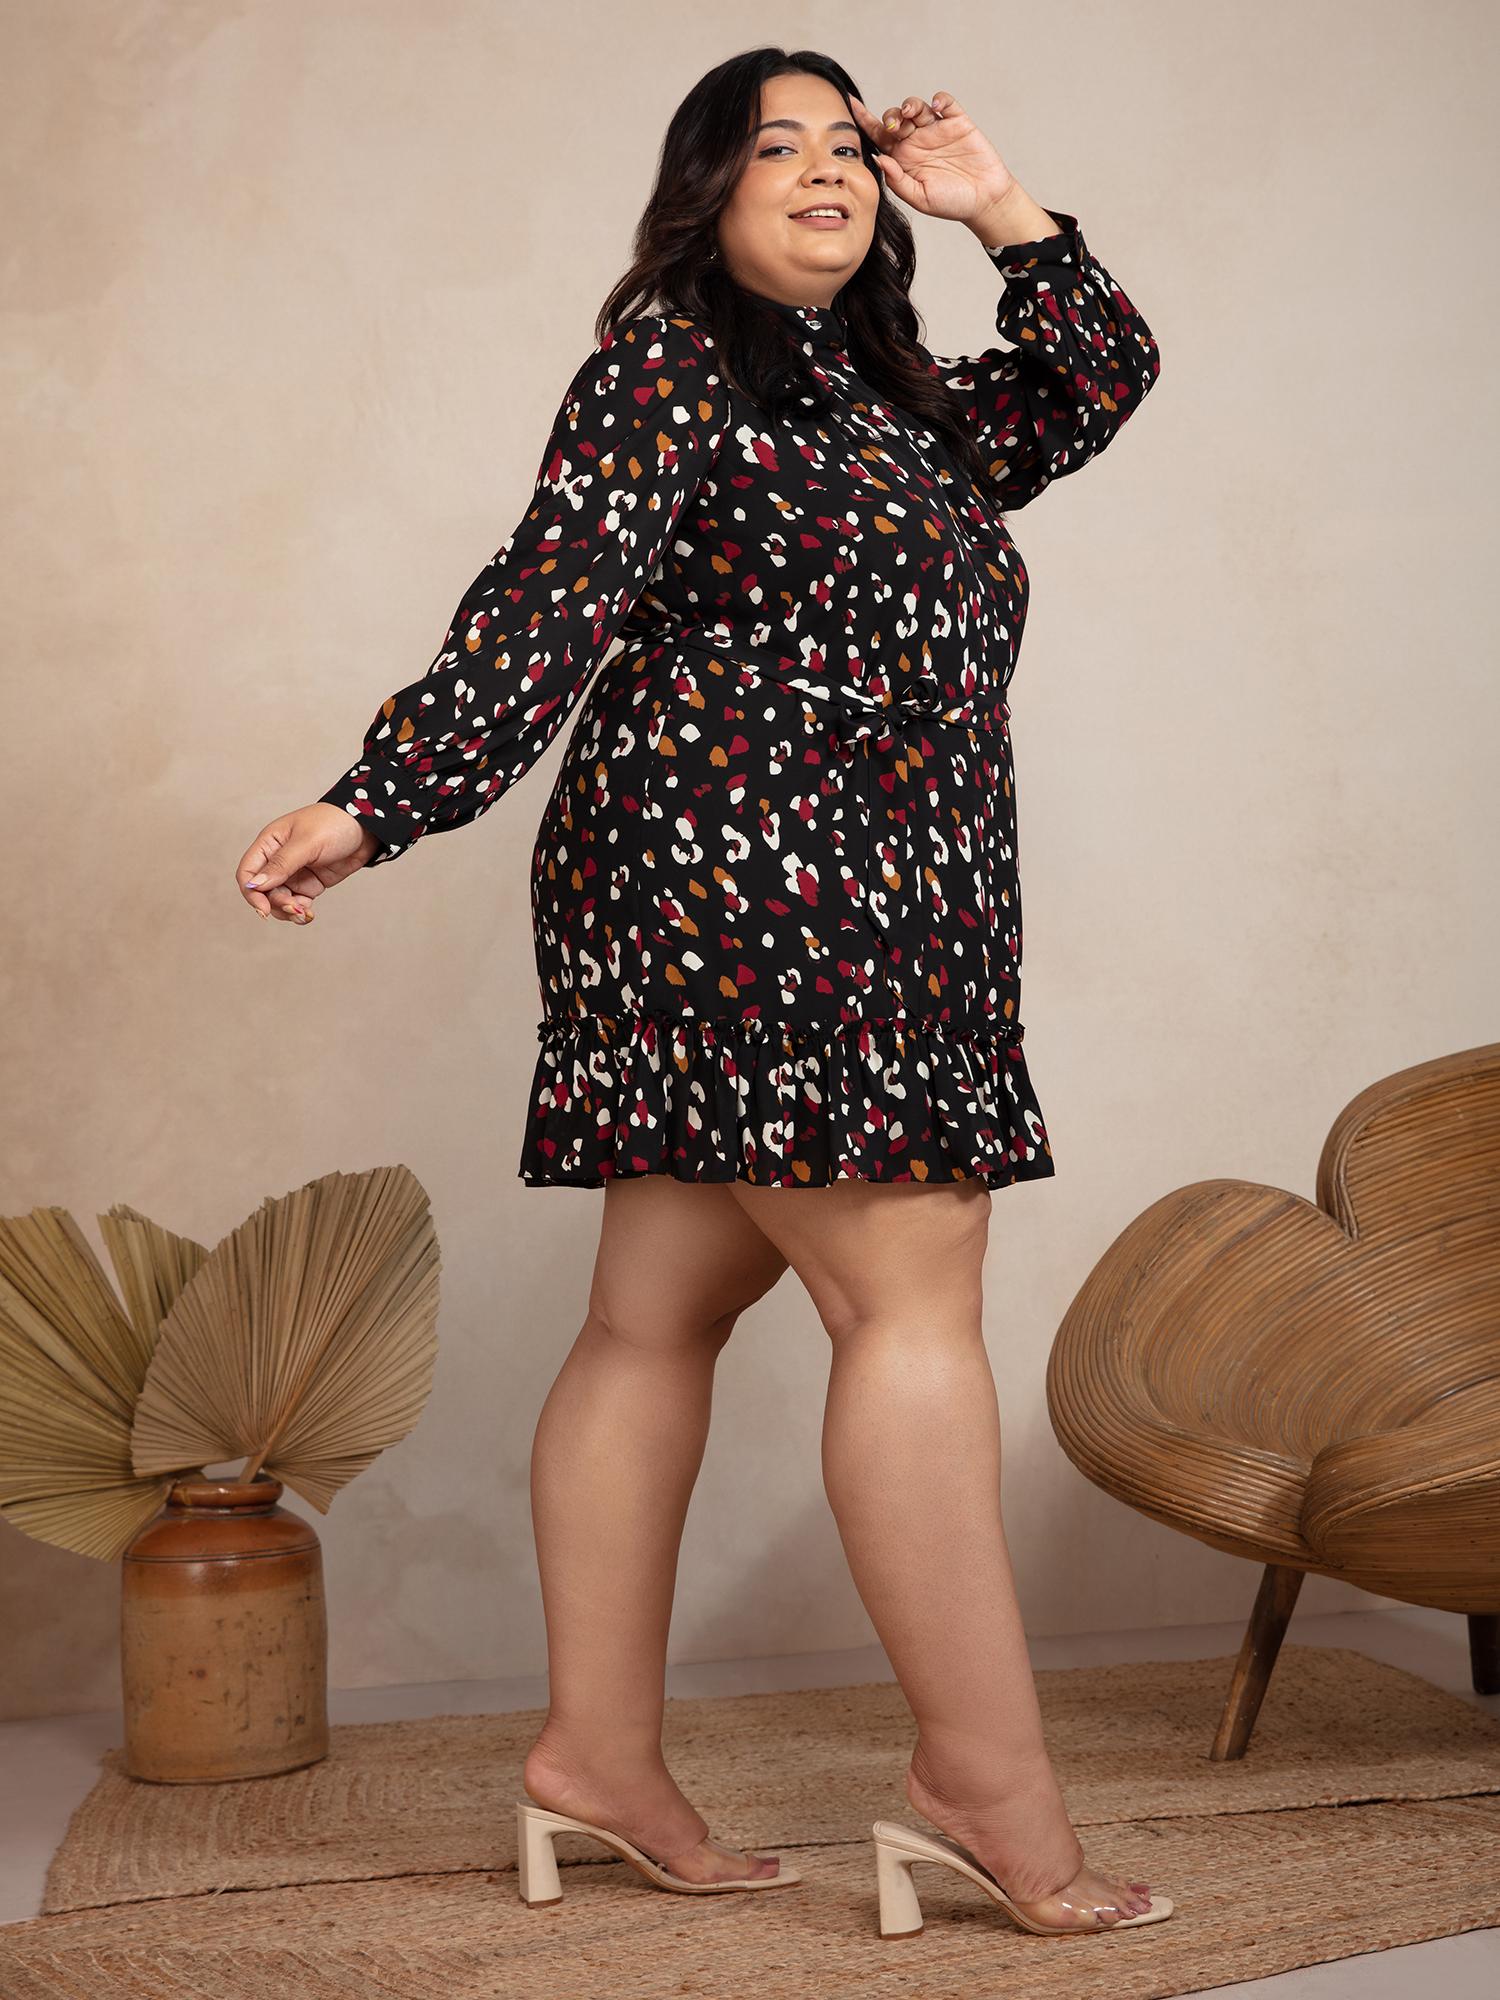 Dresses-Always So Cute Dress3